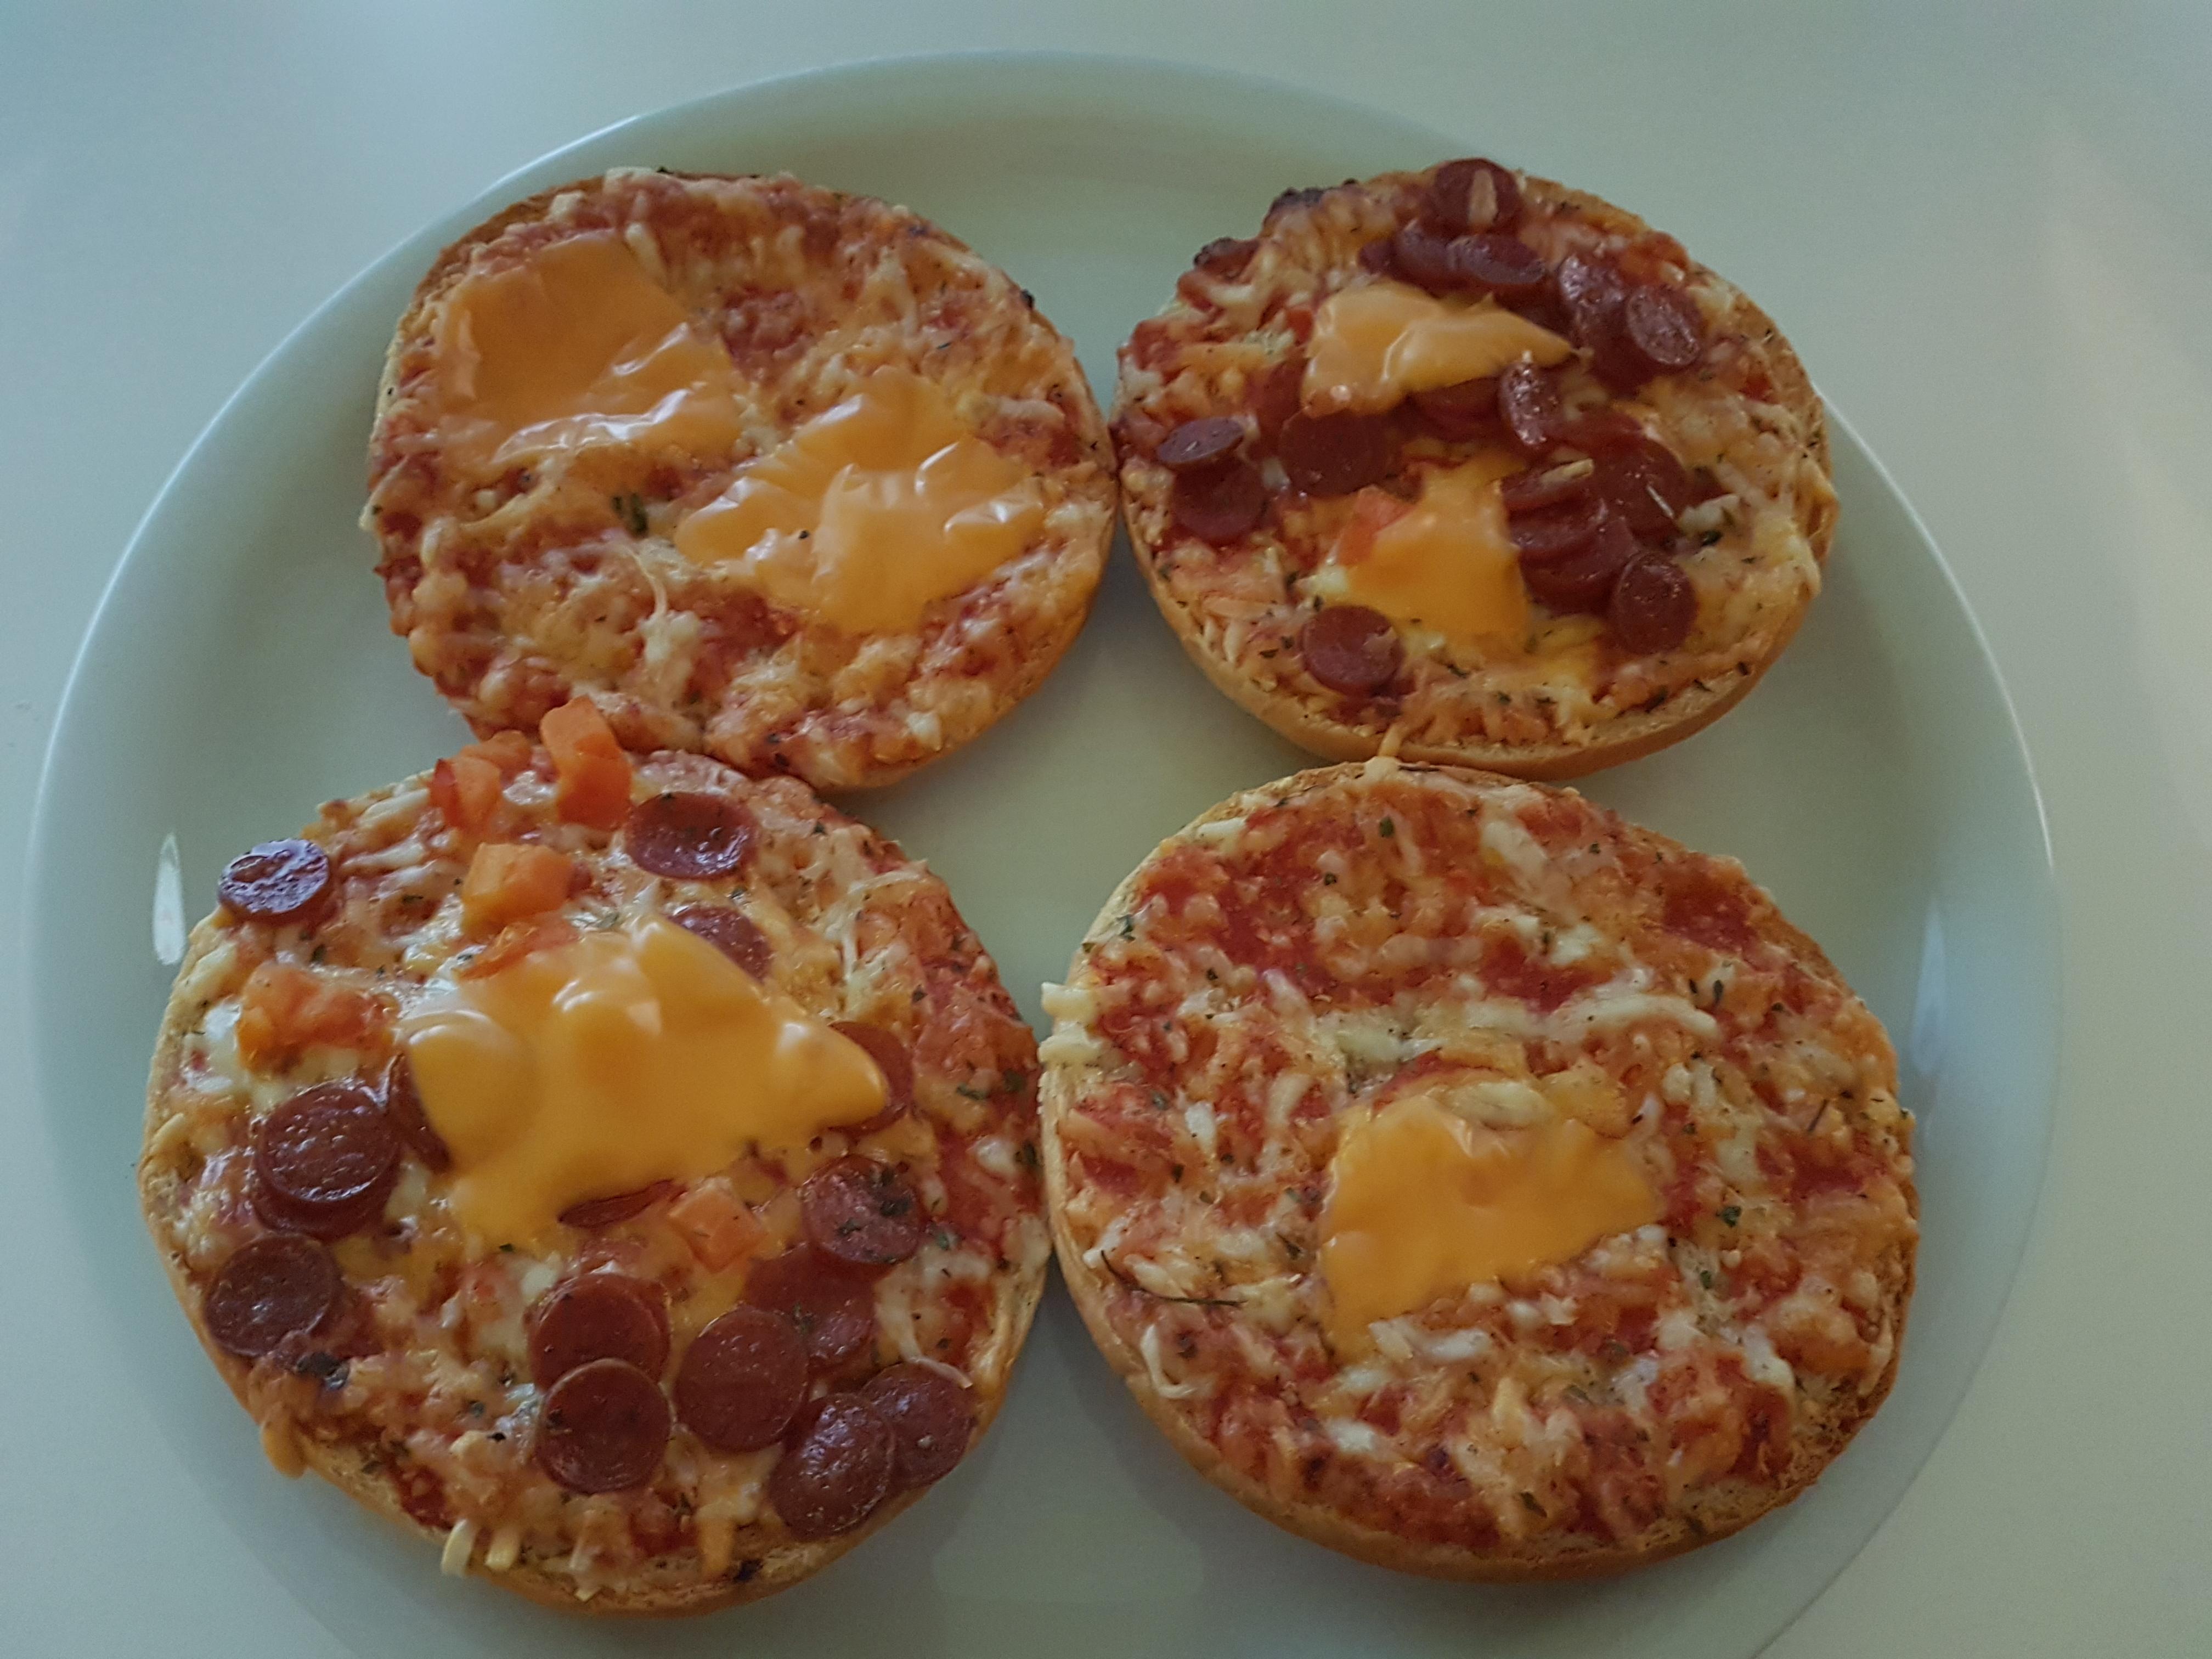 https://foodloader.net/Holz_2020-02-04_Pizzaburger.jpg